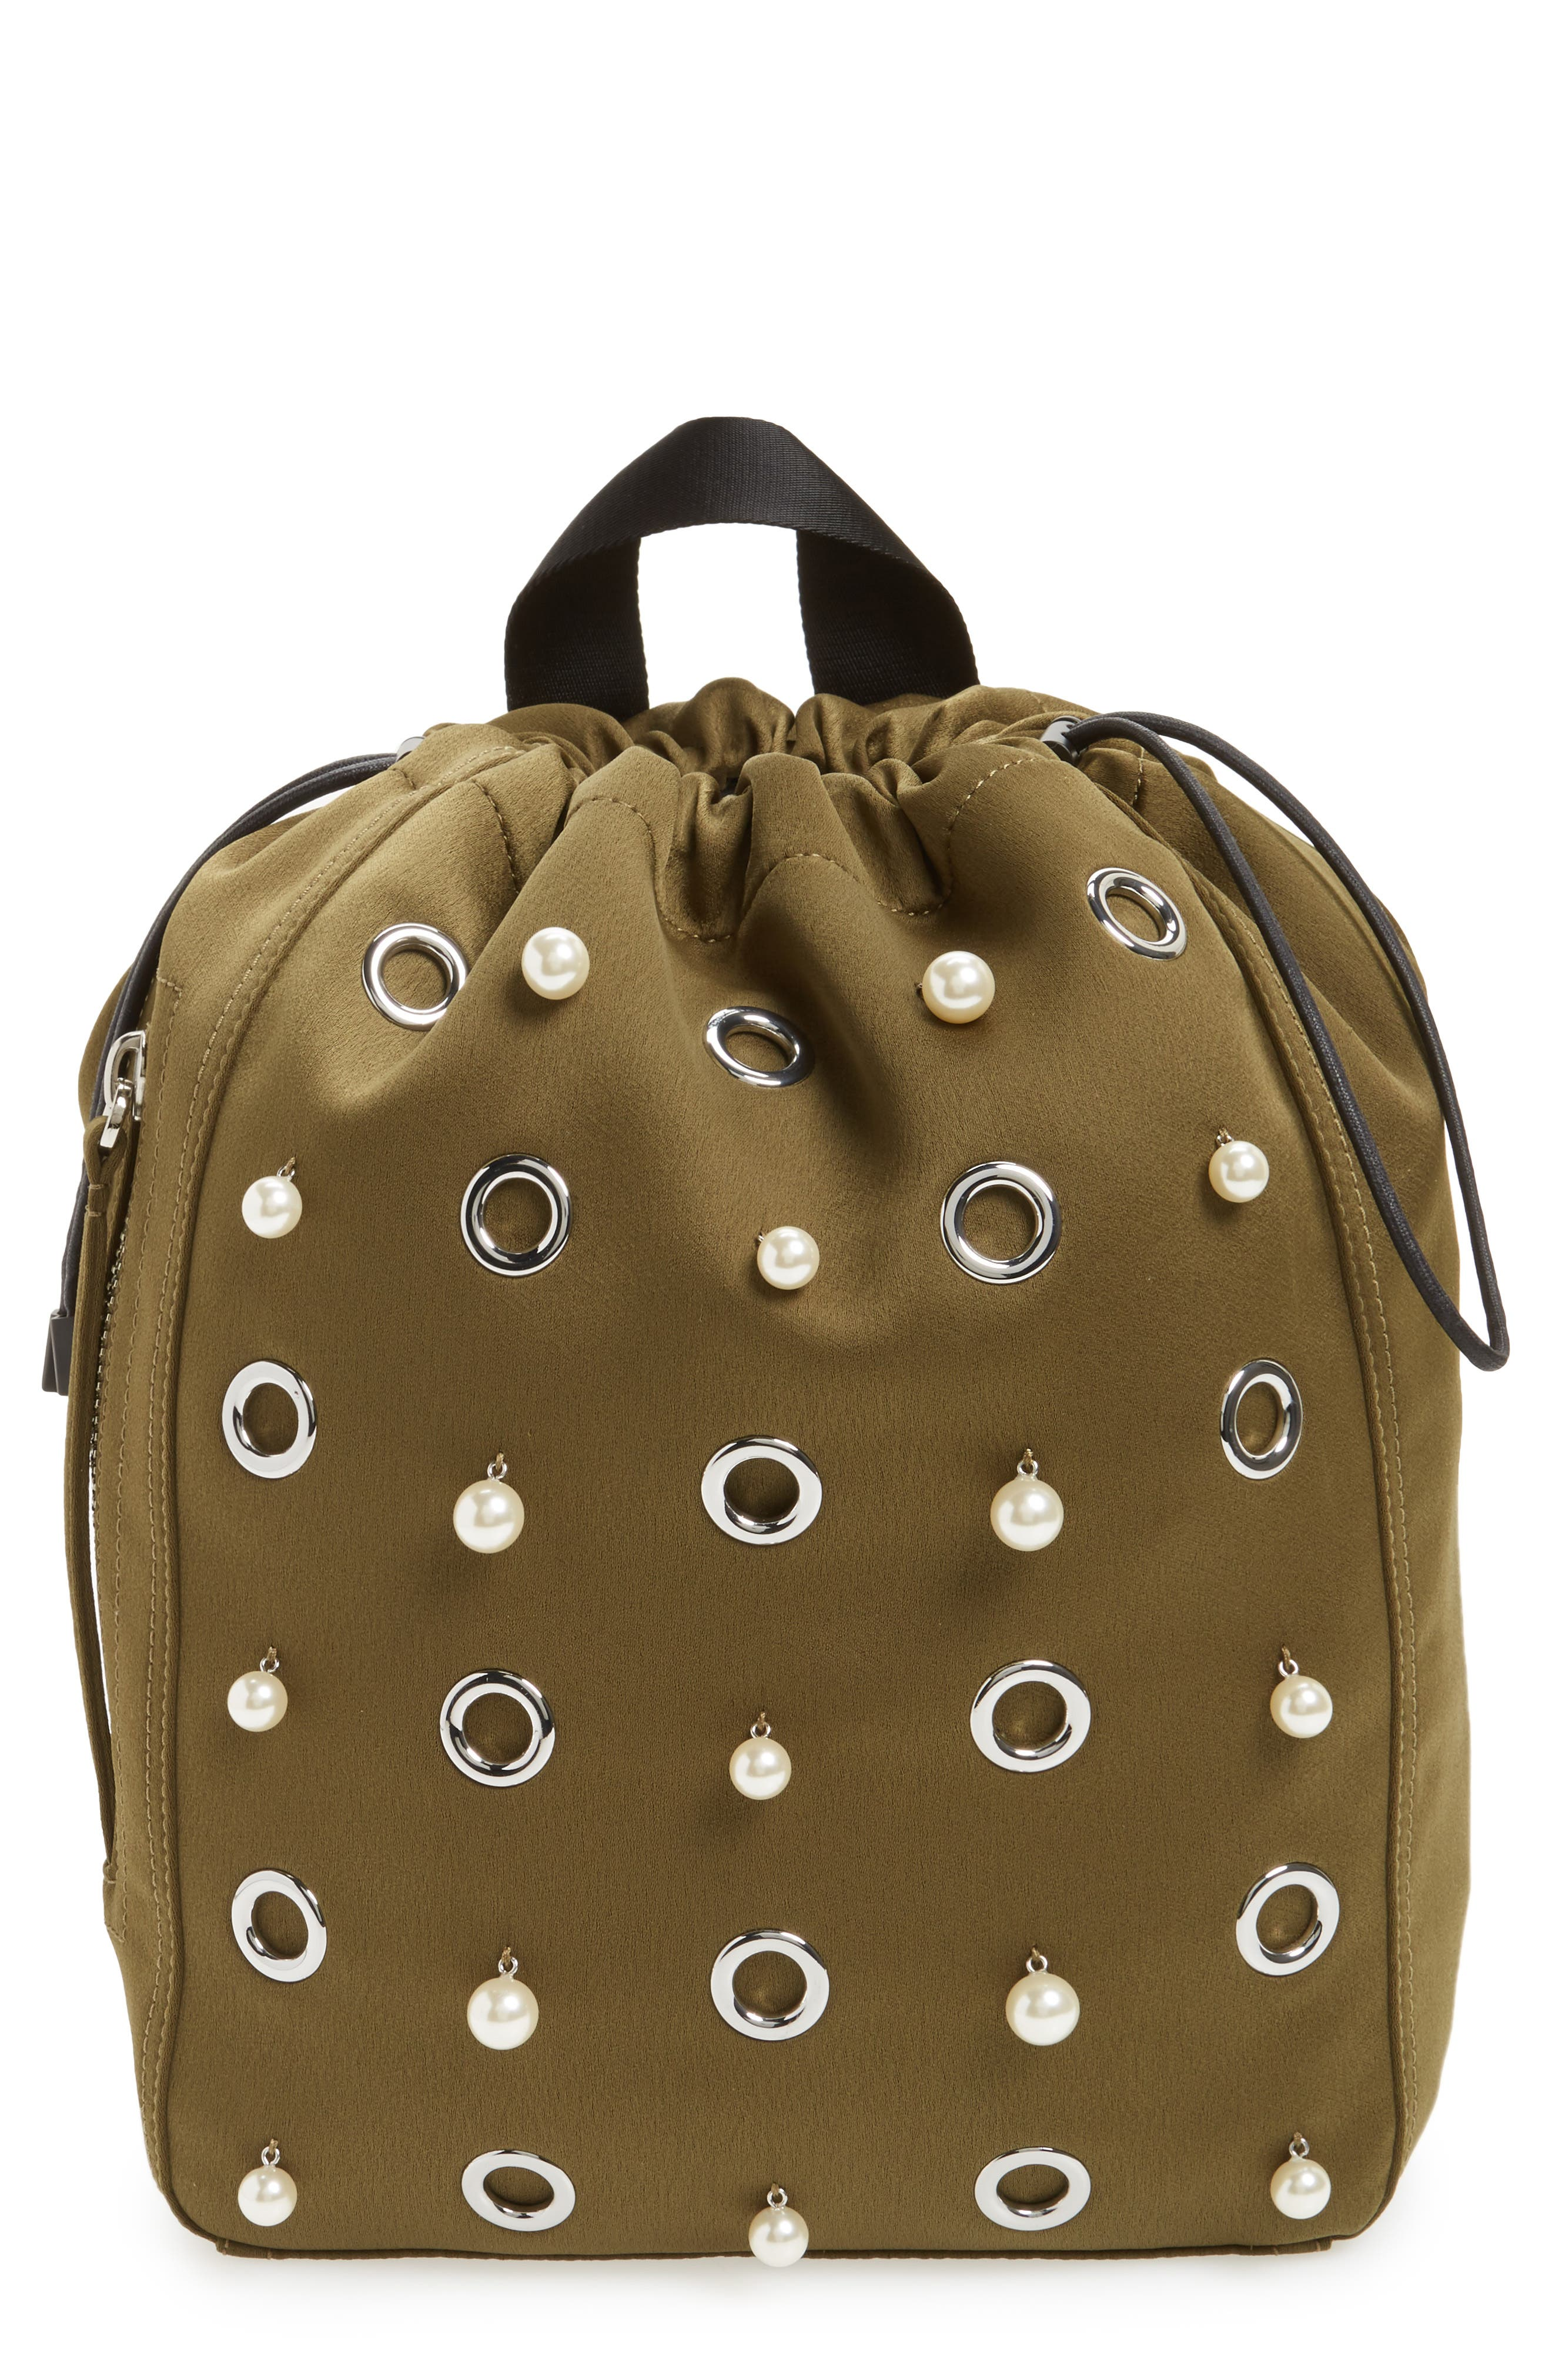 Phillip Lim 3.1 Medium Go-Go Embellished Backpack,                             Main thumbnail 1, color,                             301